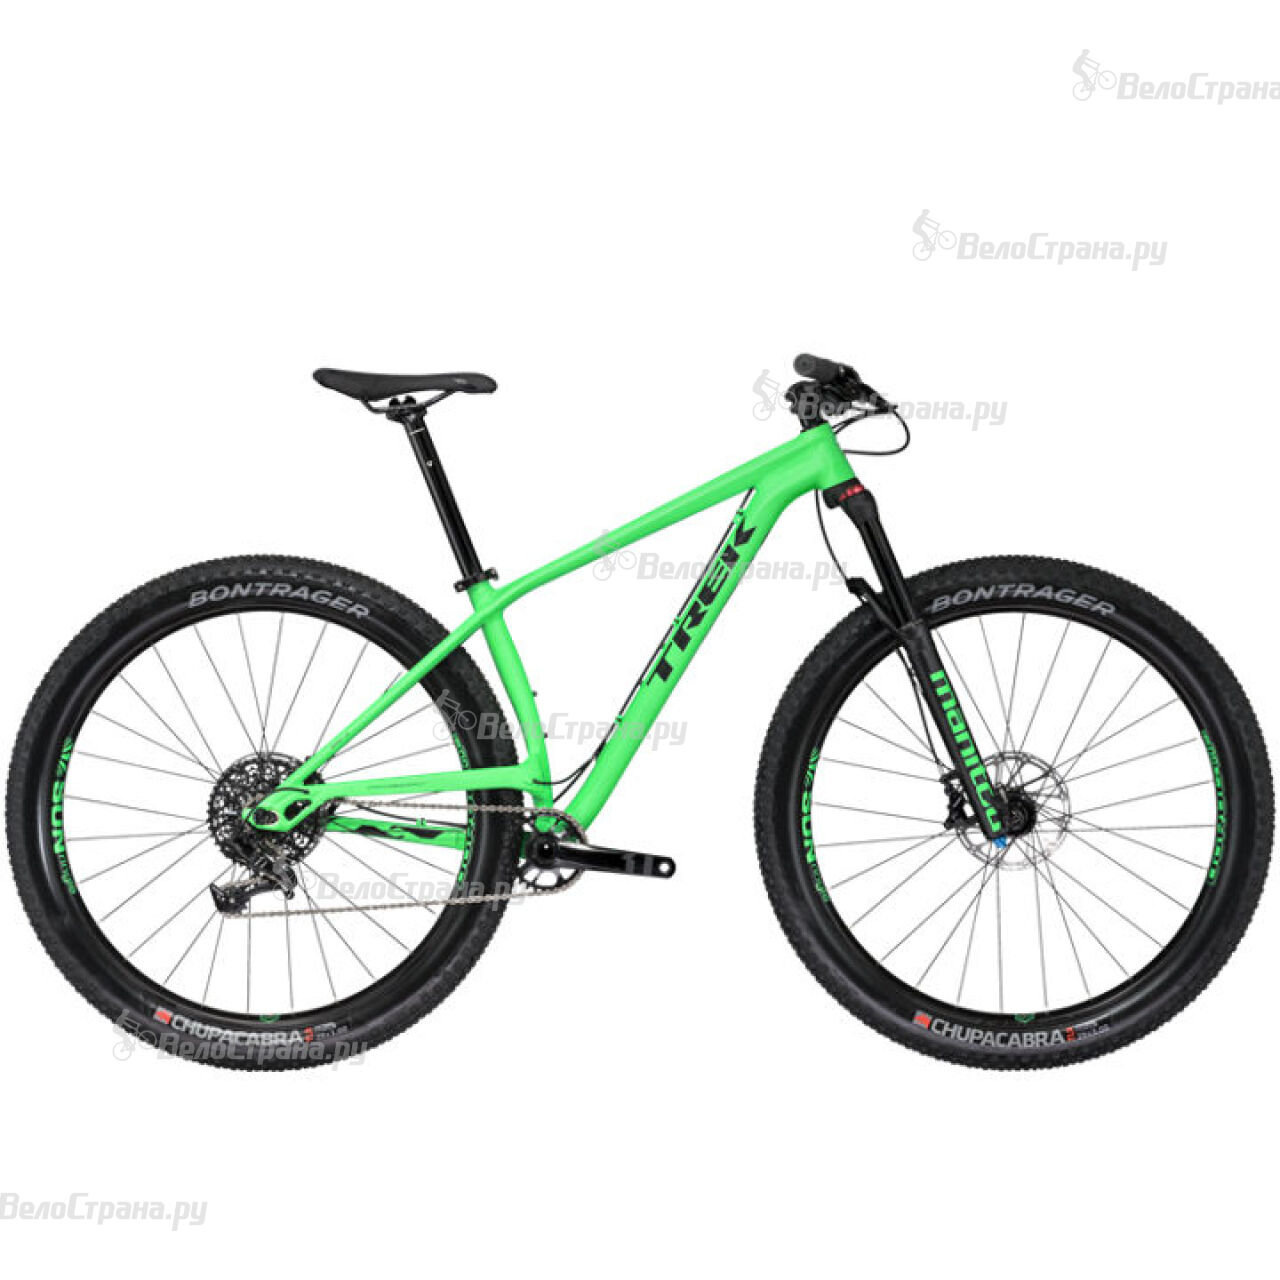 Велосипед Trek Stache 7 (2017) trek stache 7 2014